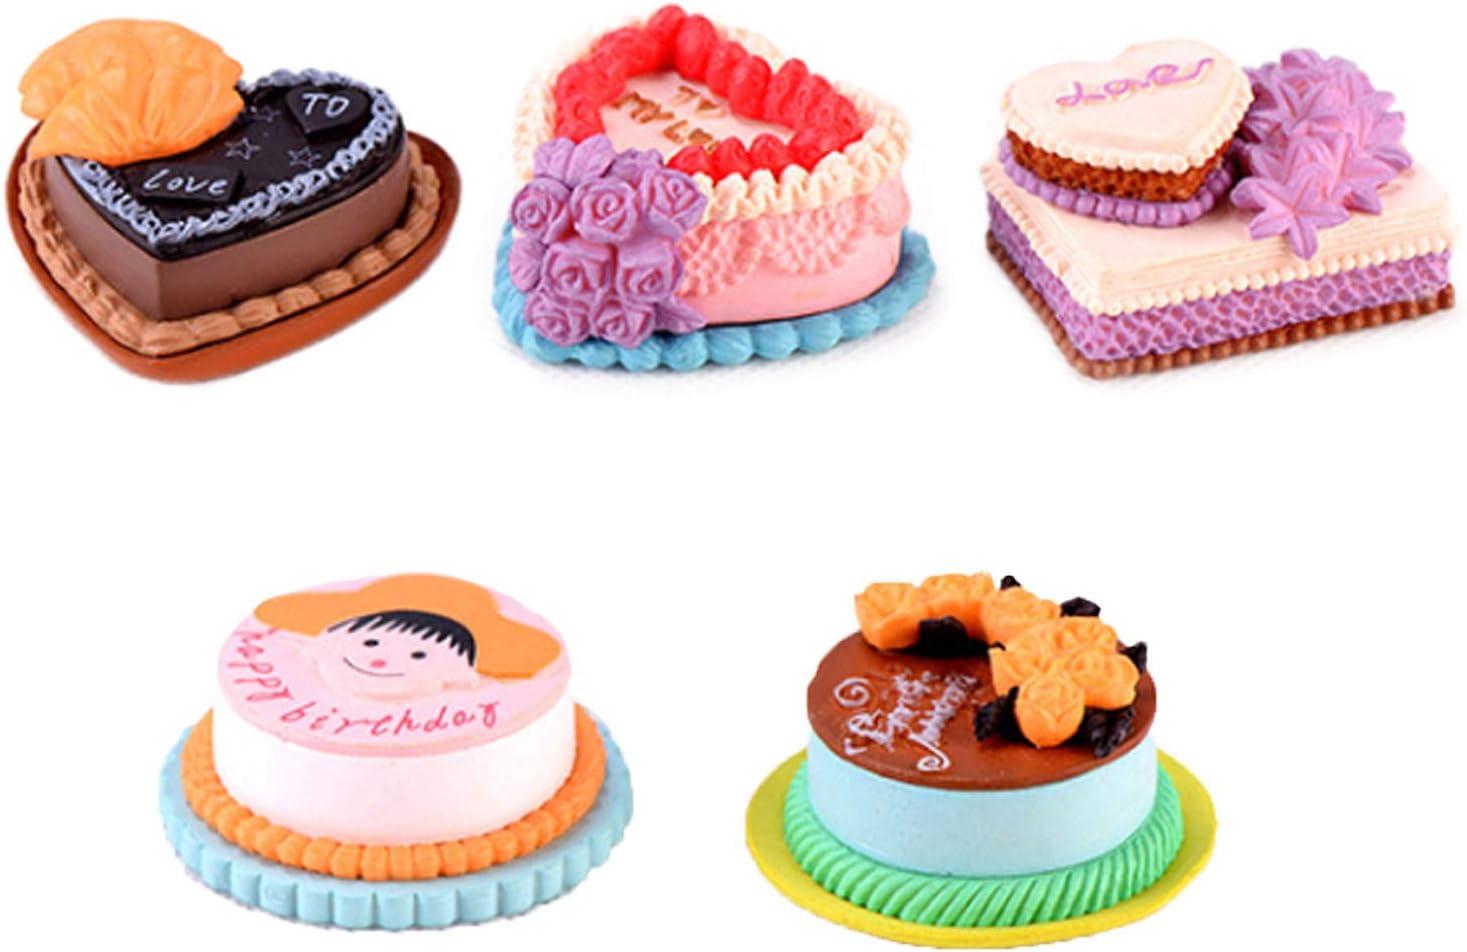 Max 44% OFF Outlet sale feature ERANCE 5 Pcs Cake Food Miniature Dollhouse